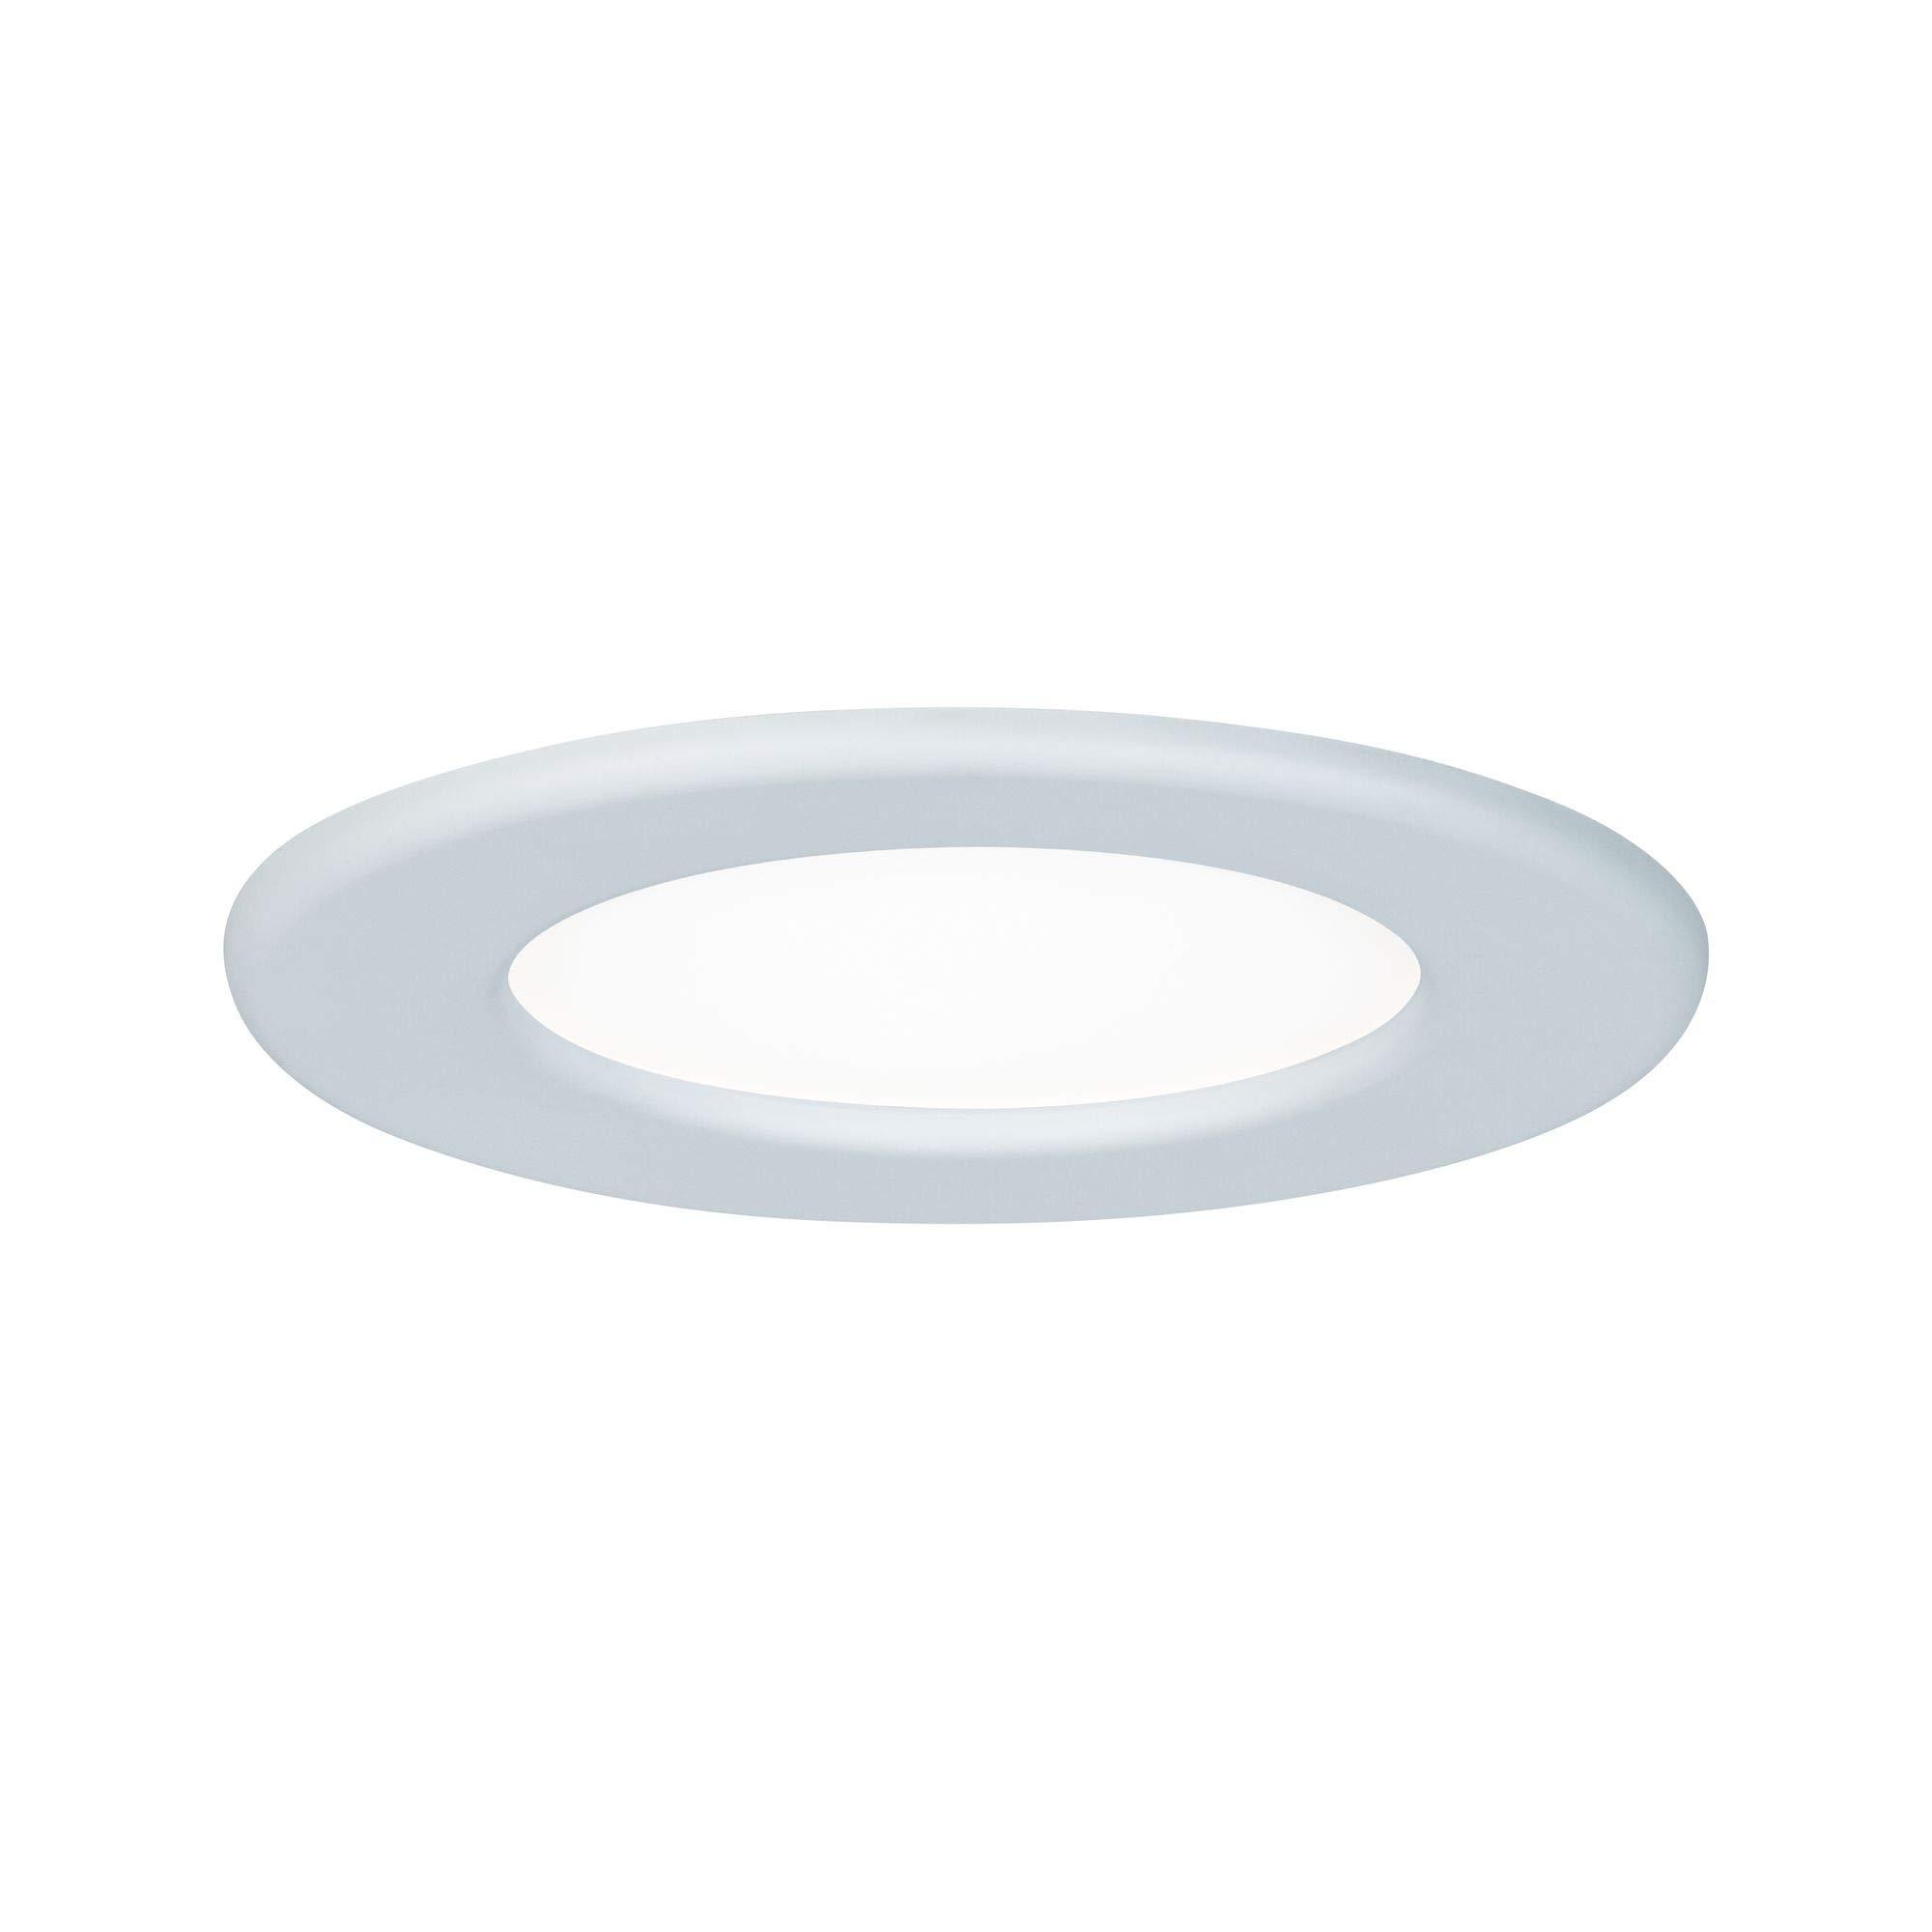 Paulmann 灯具 Paulmann 柏曼 92058 嵌入式面板 圆形吸顶灯 6W 灯 4000K 自然白光 LED 面板 白色 IP44 防溅水 包含灯泡 嵌入式灯 塑料 6 W